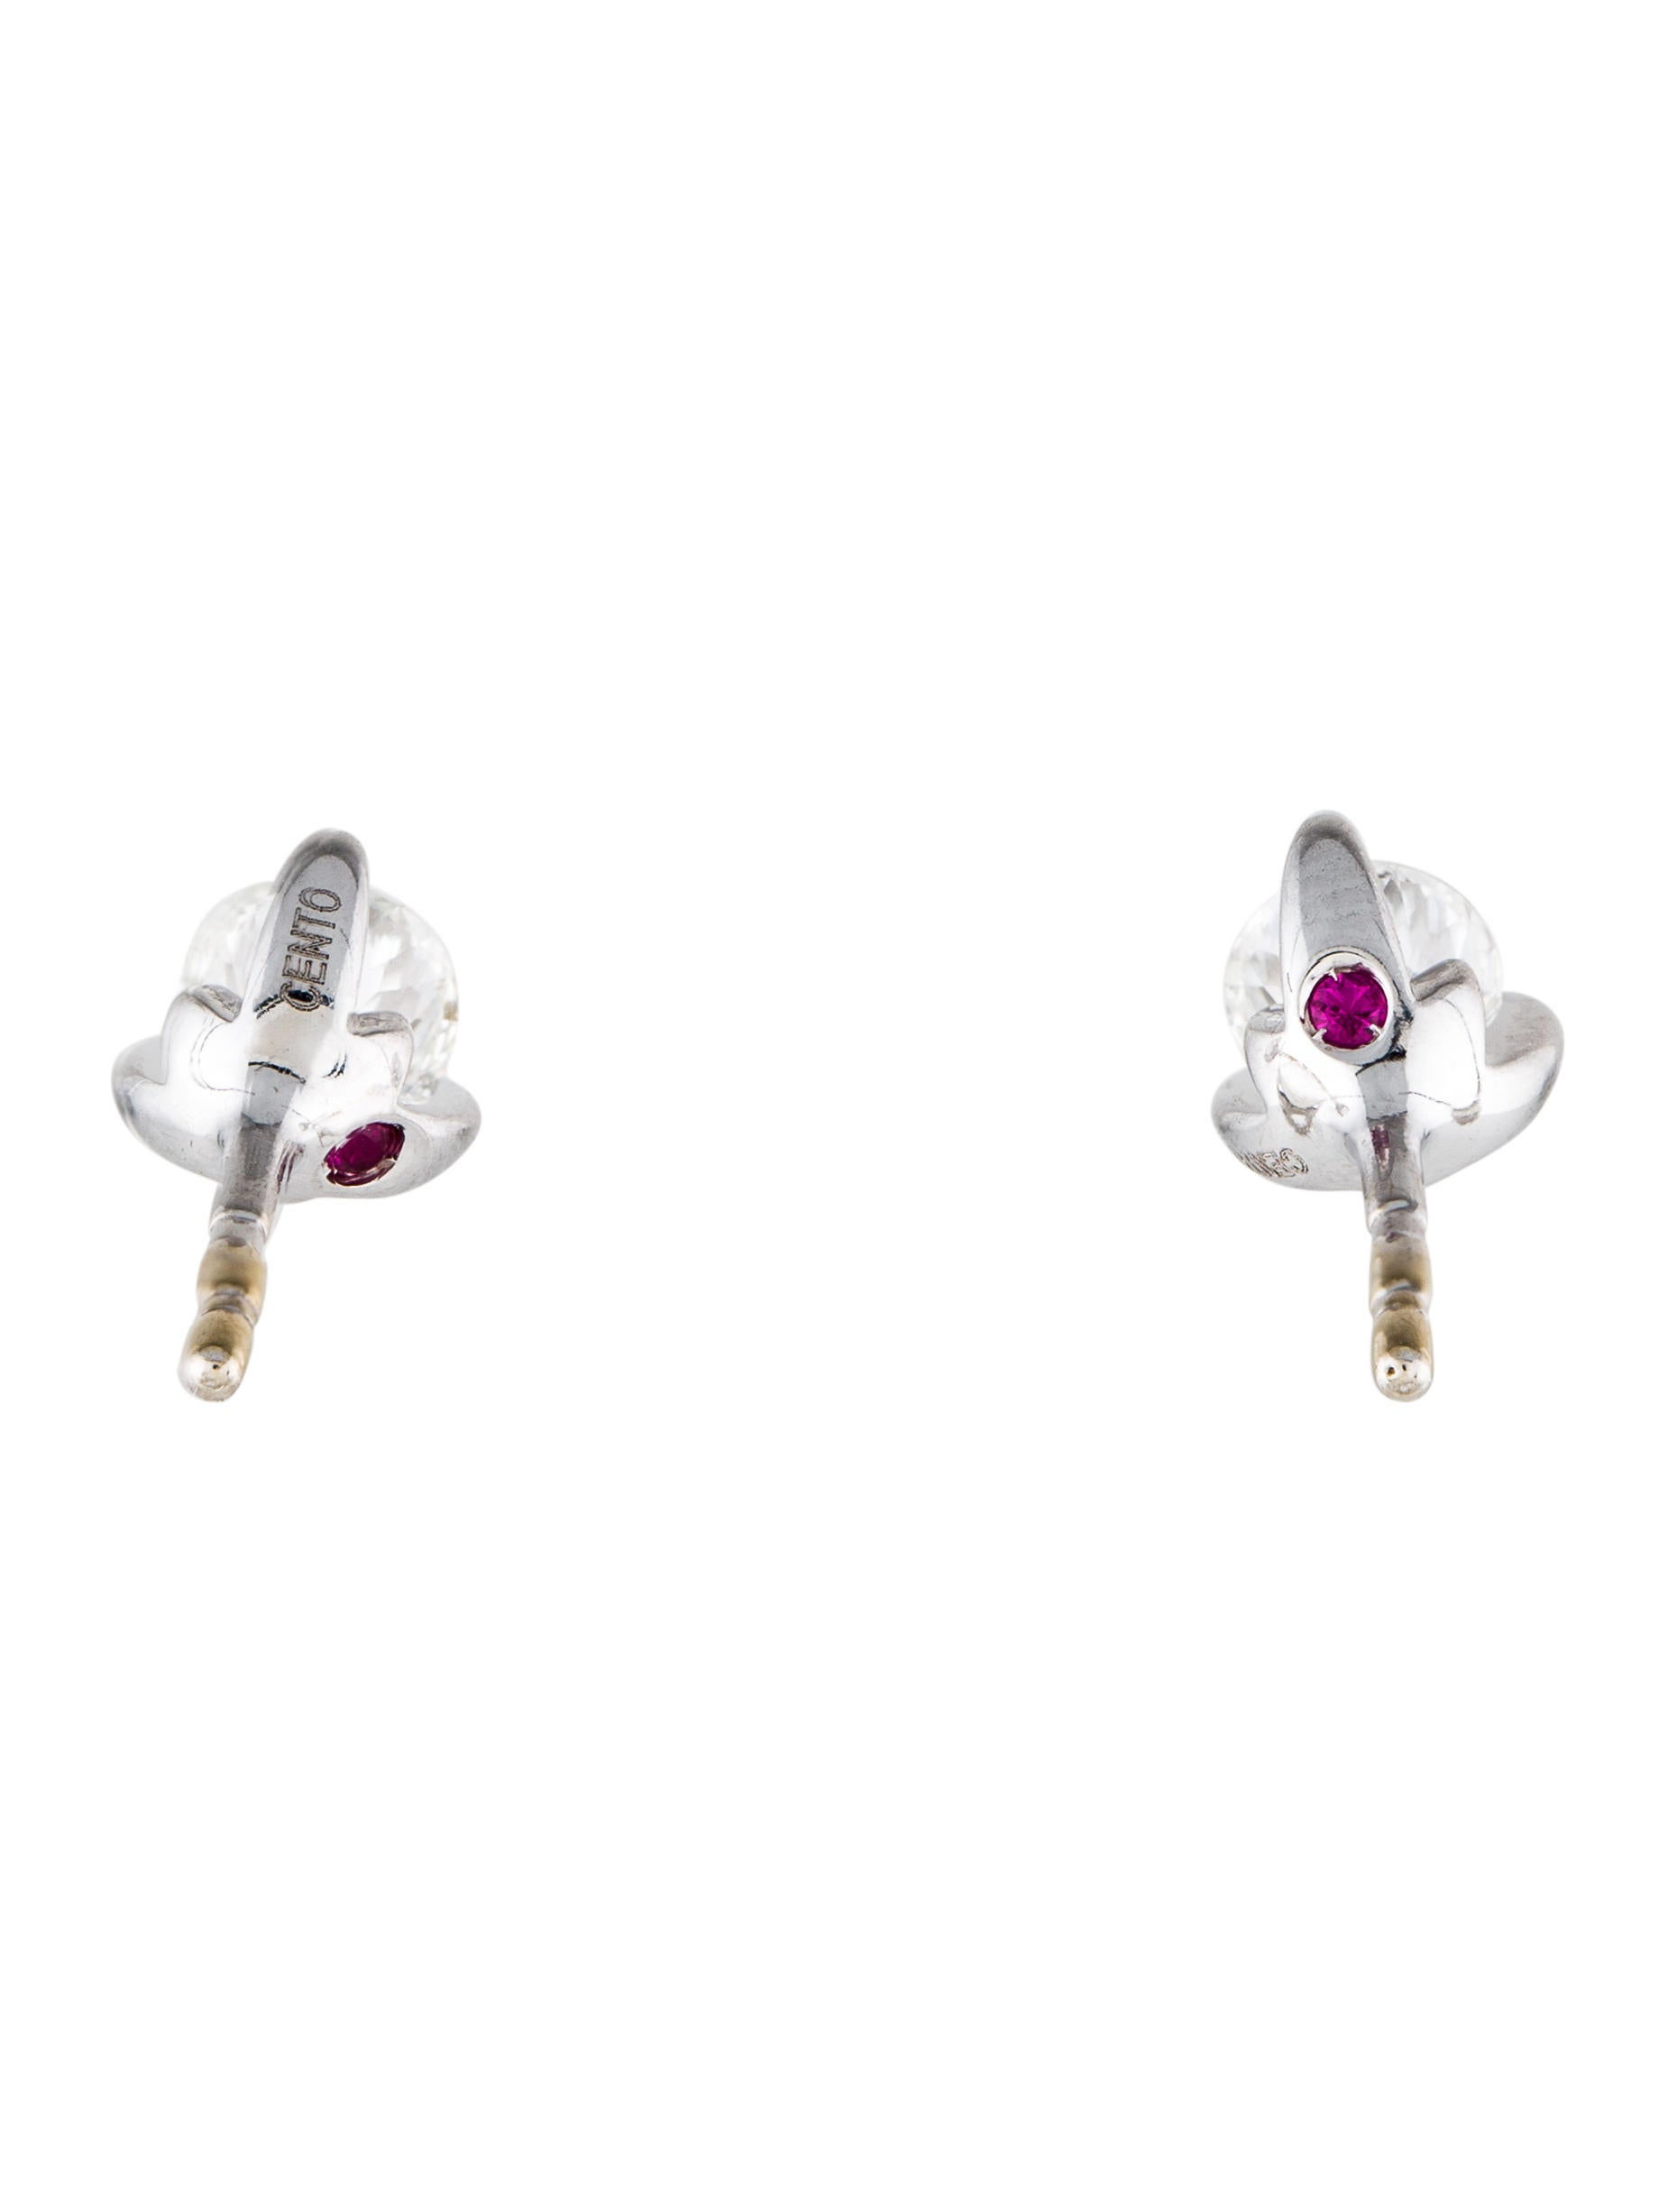 Roberto Coin Cento Diamond Stud Earrings Image Of Earring